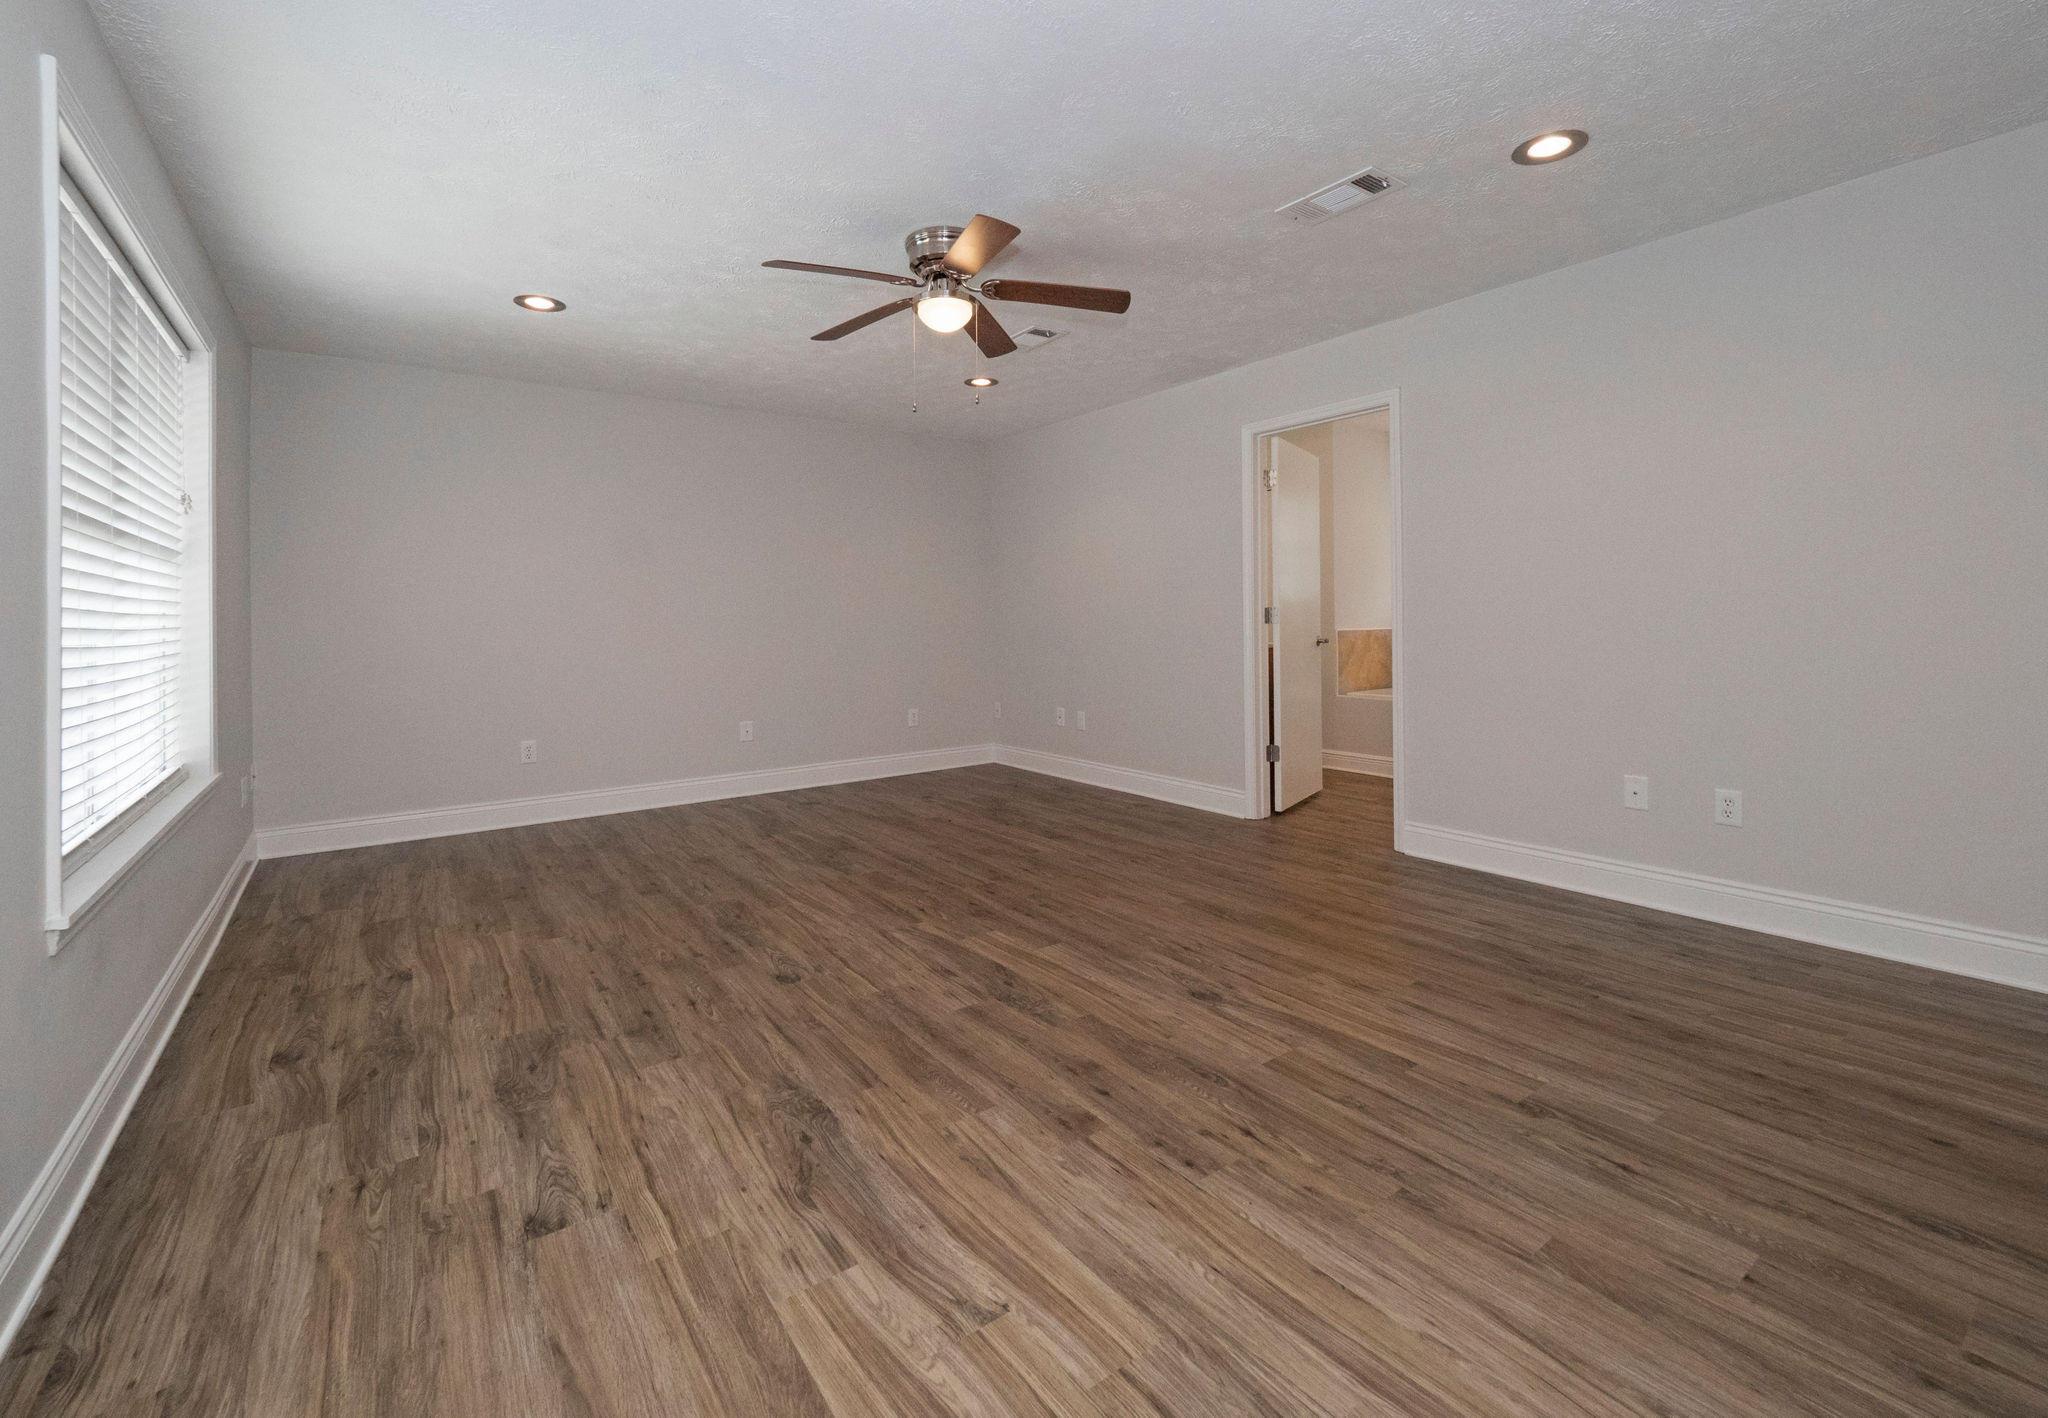 Anacoco home for sale, 425 Liles Rd, Anacoco LA - $235,000